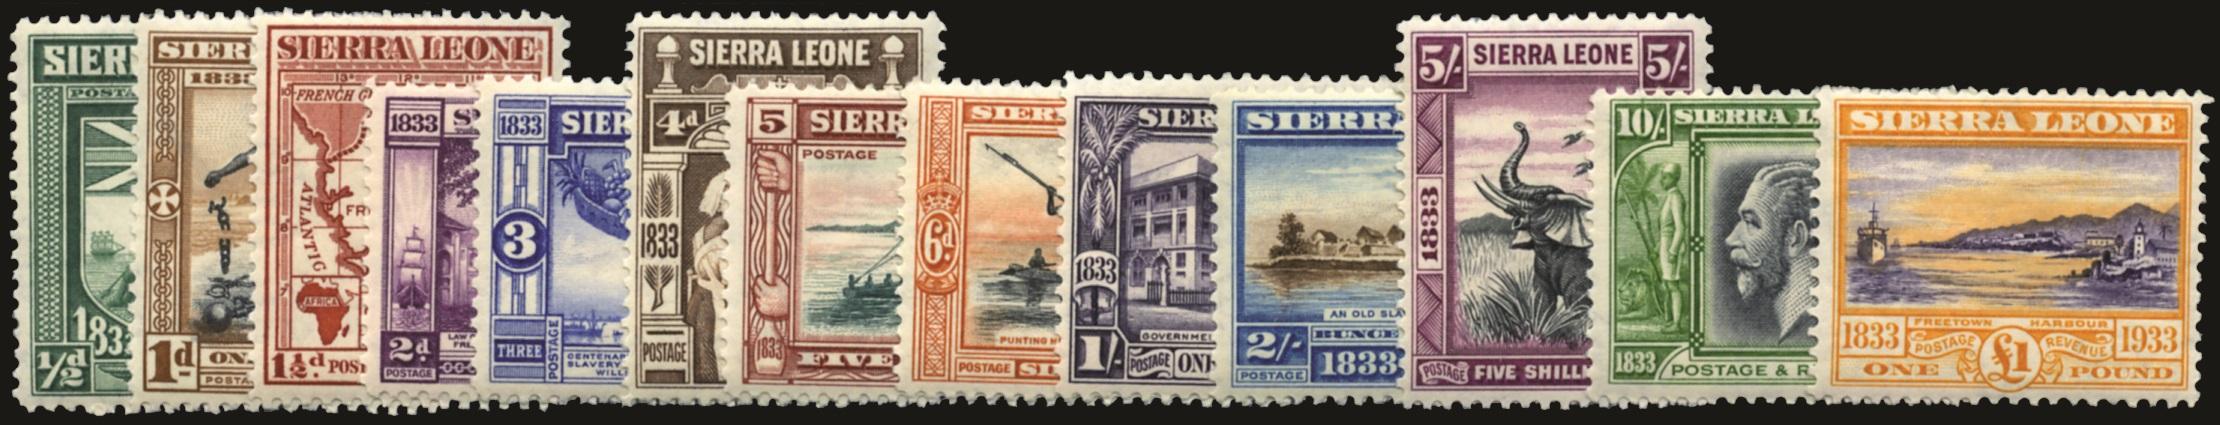 SIERRA LEONE 1933  SG168/80 Mint